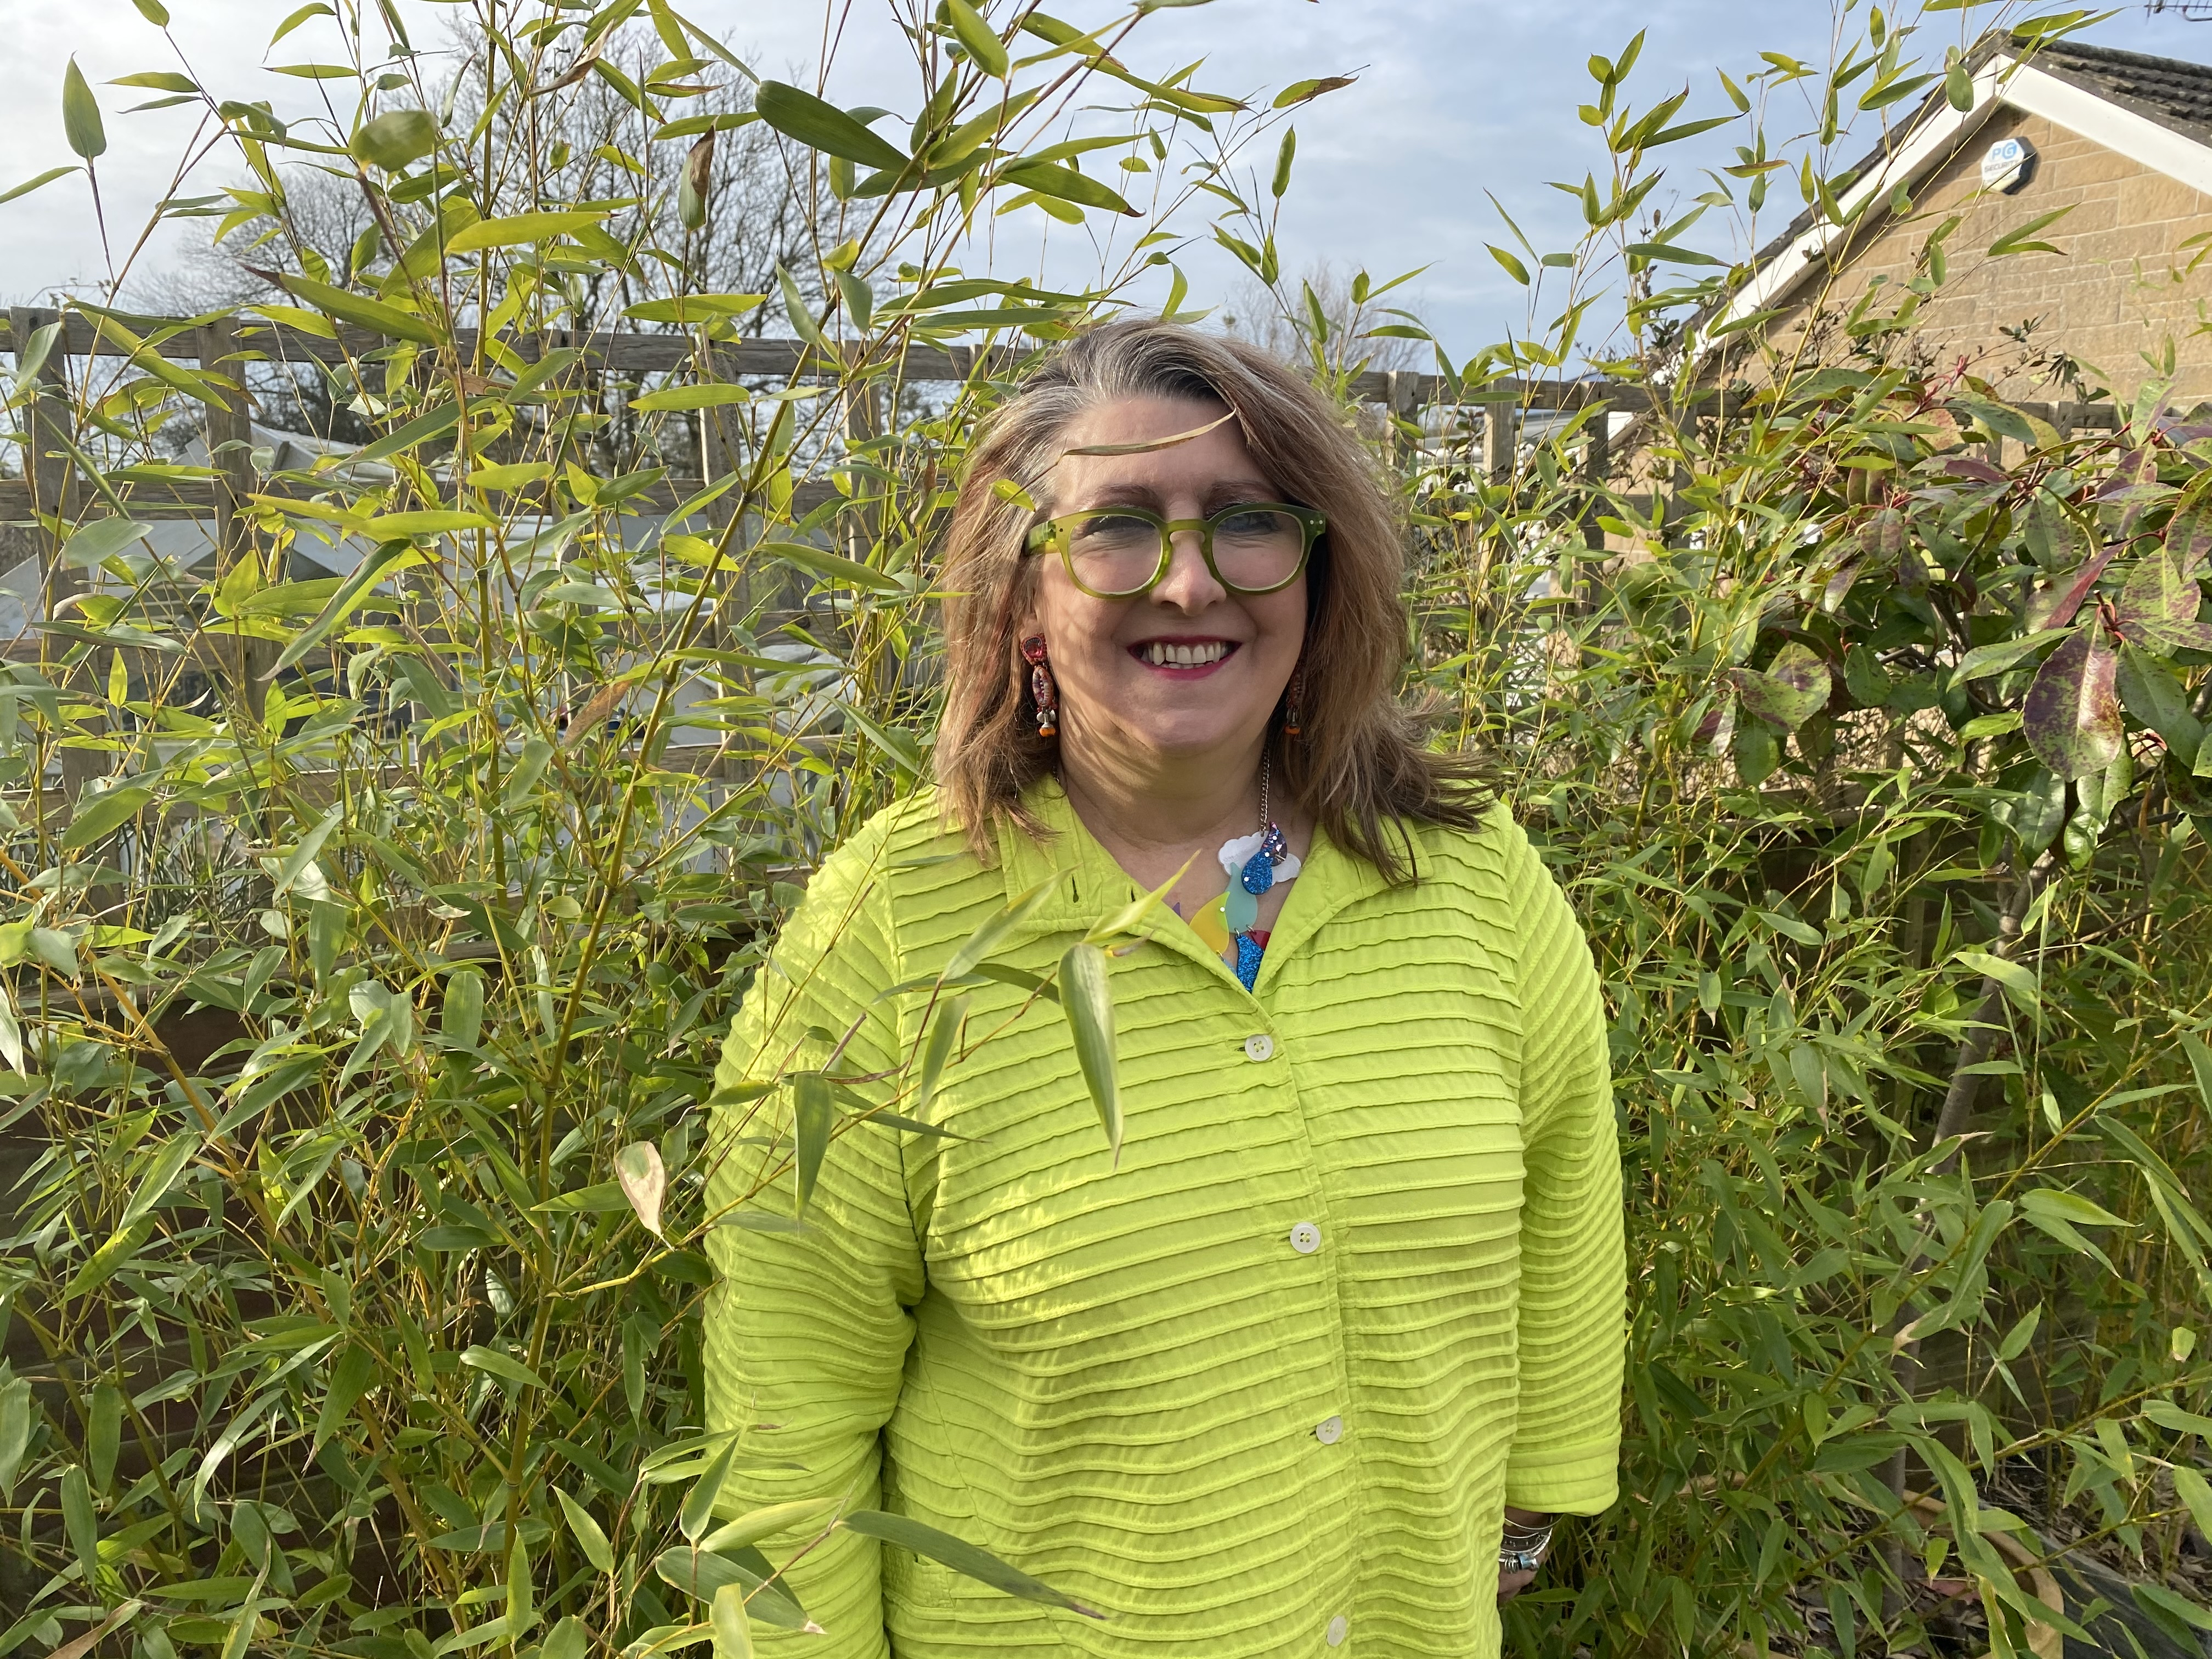 Above: Rosie Trow in her real garden.